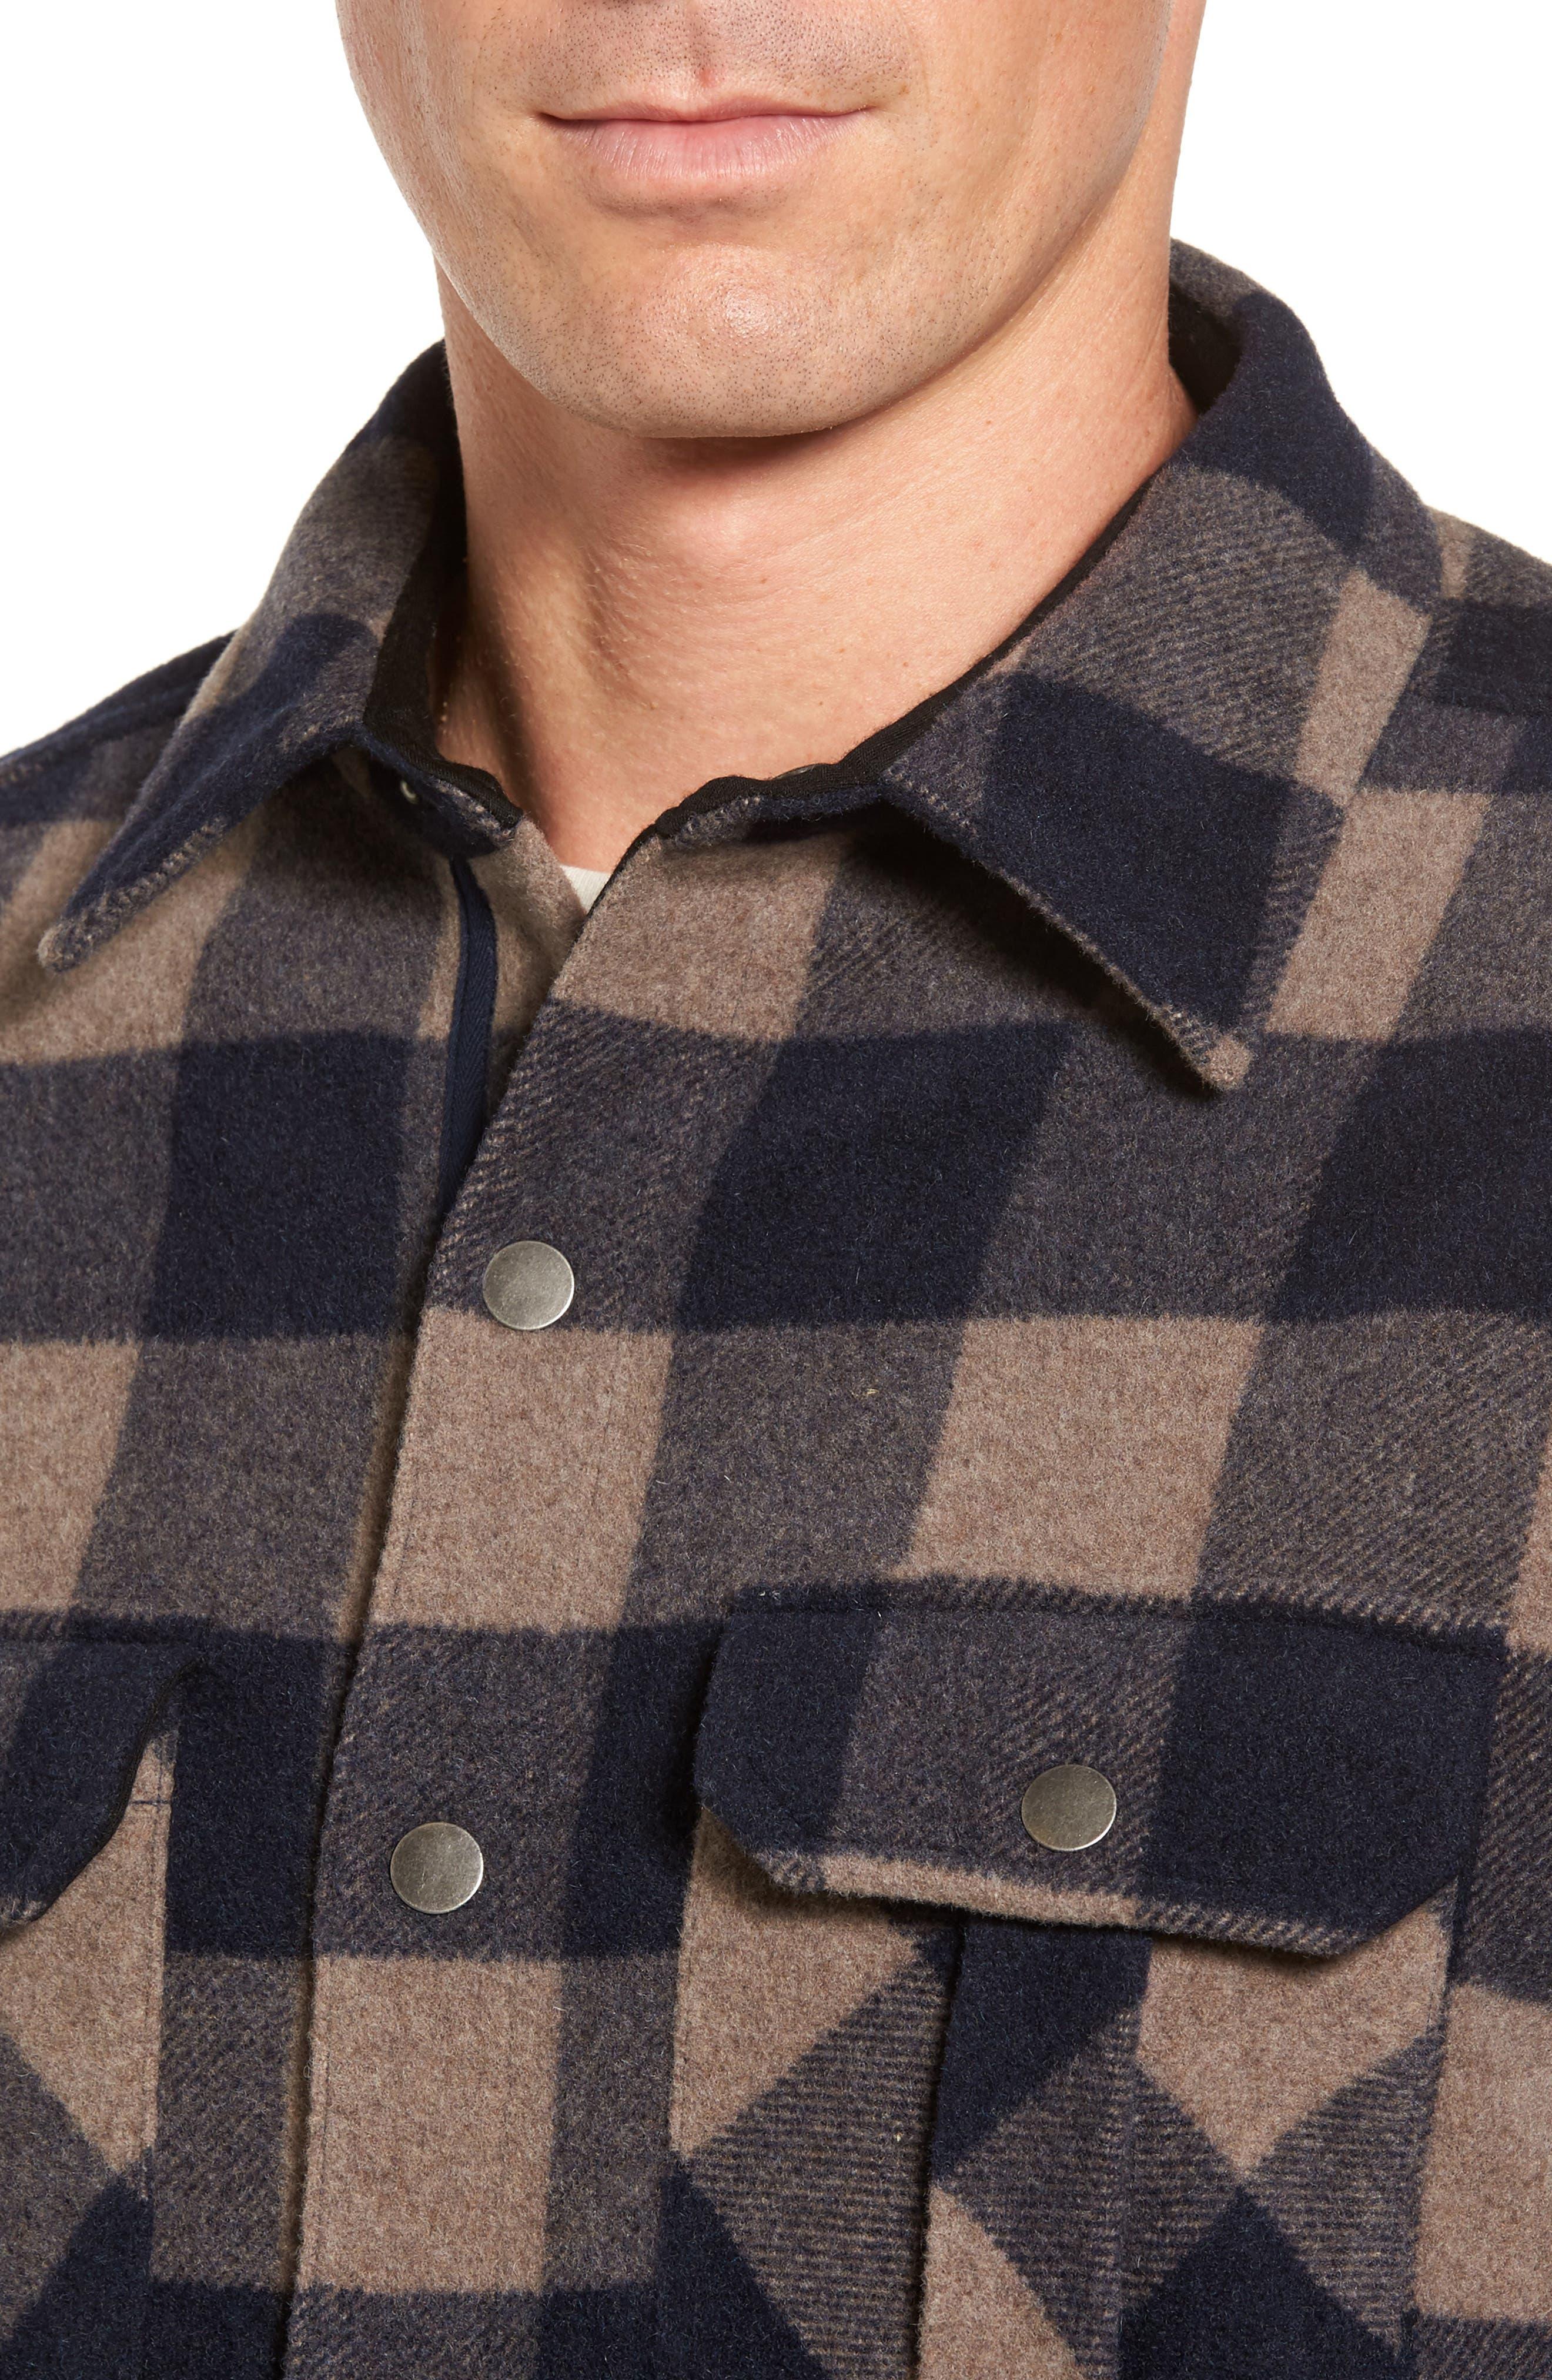 Anchor Line Flannel Shirt Jacket,                             Alternate thumbnail 4, color,                             Navy